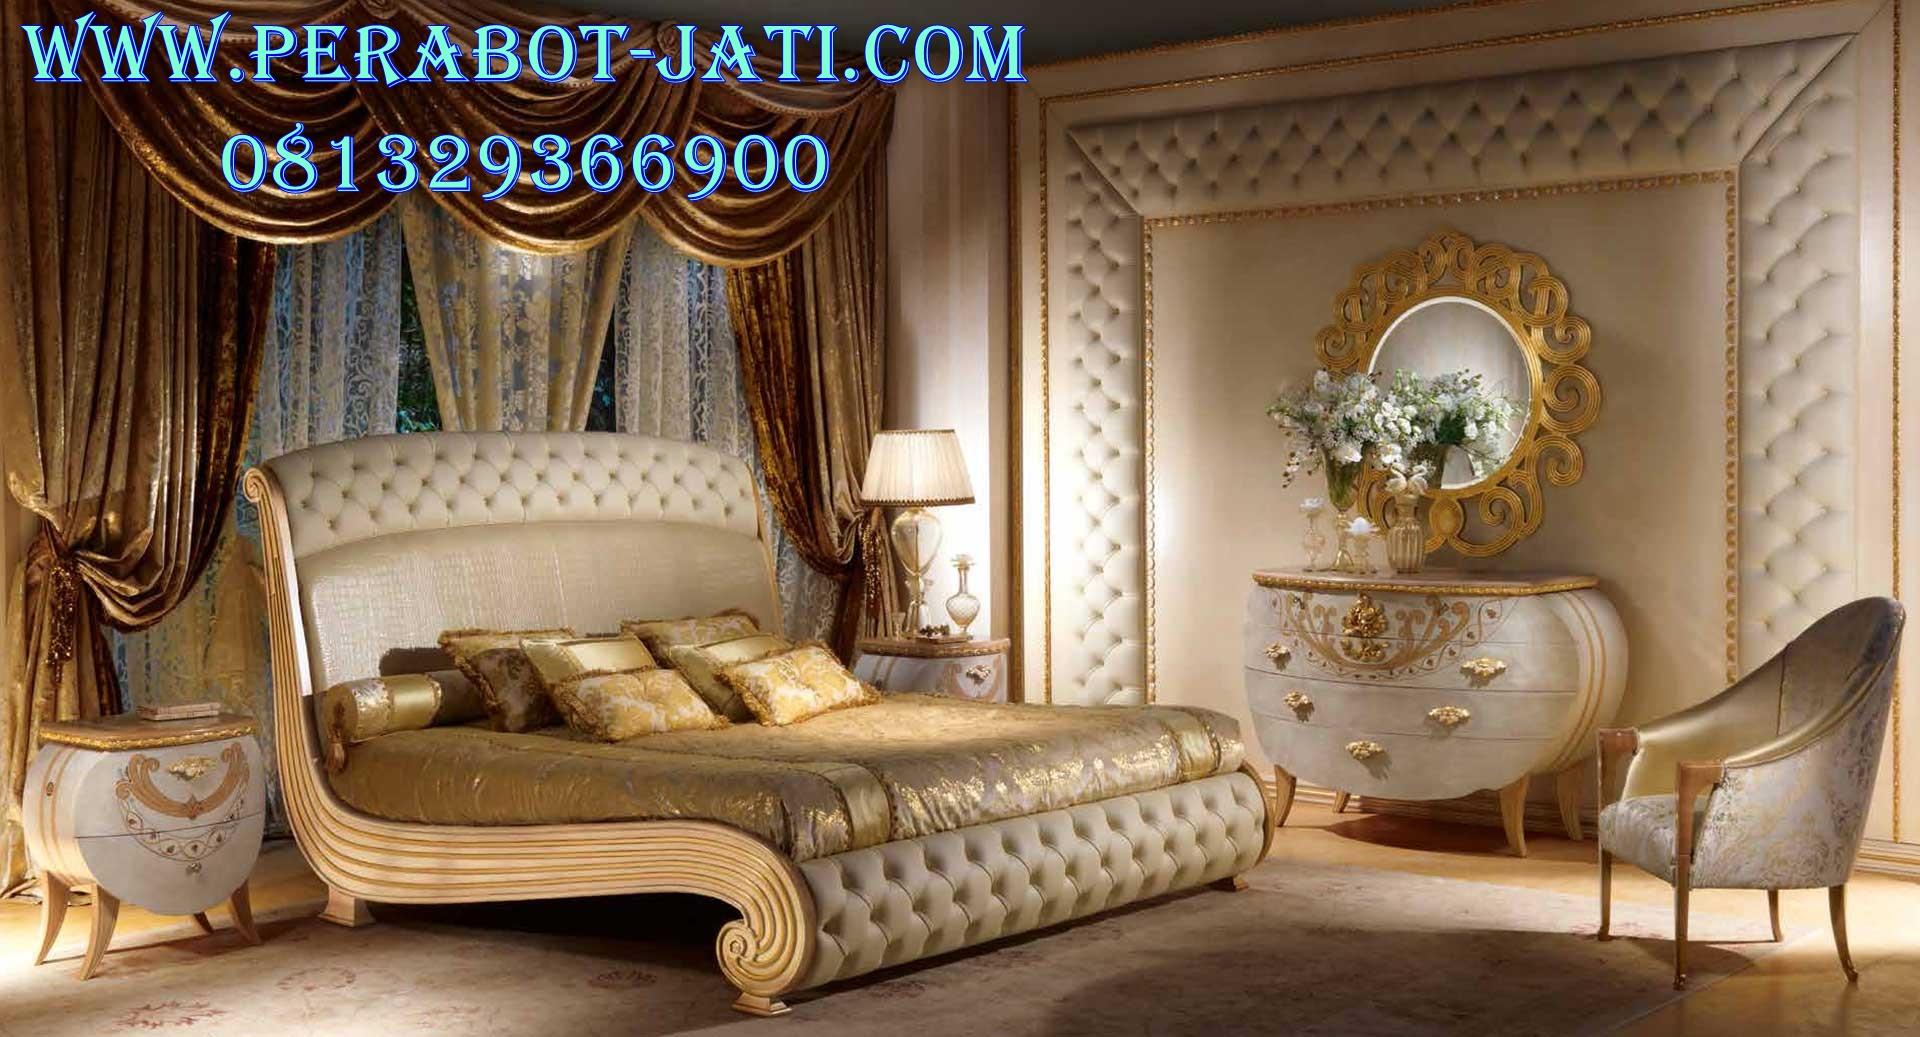 Furniture Tempat Tidur Klasik Mewah Lengkung Gold Gastone